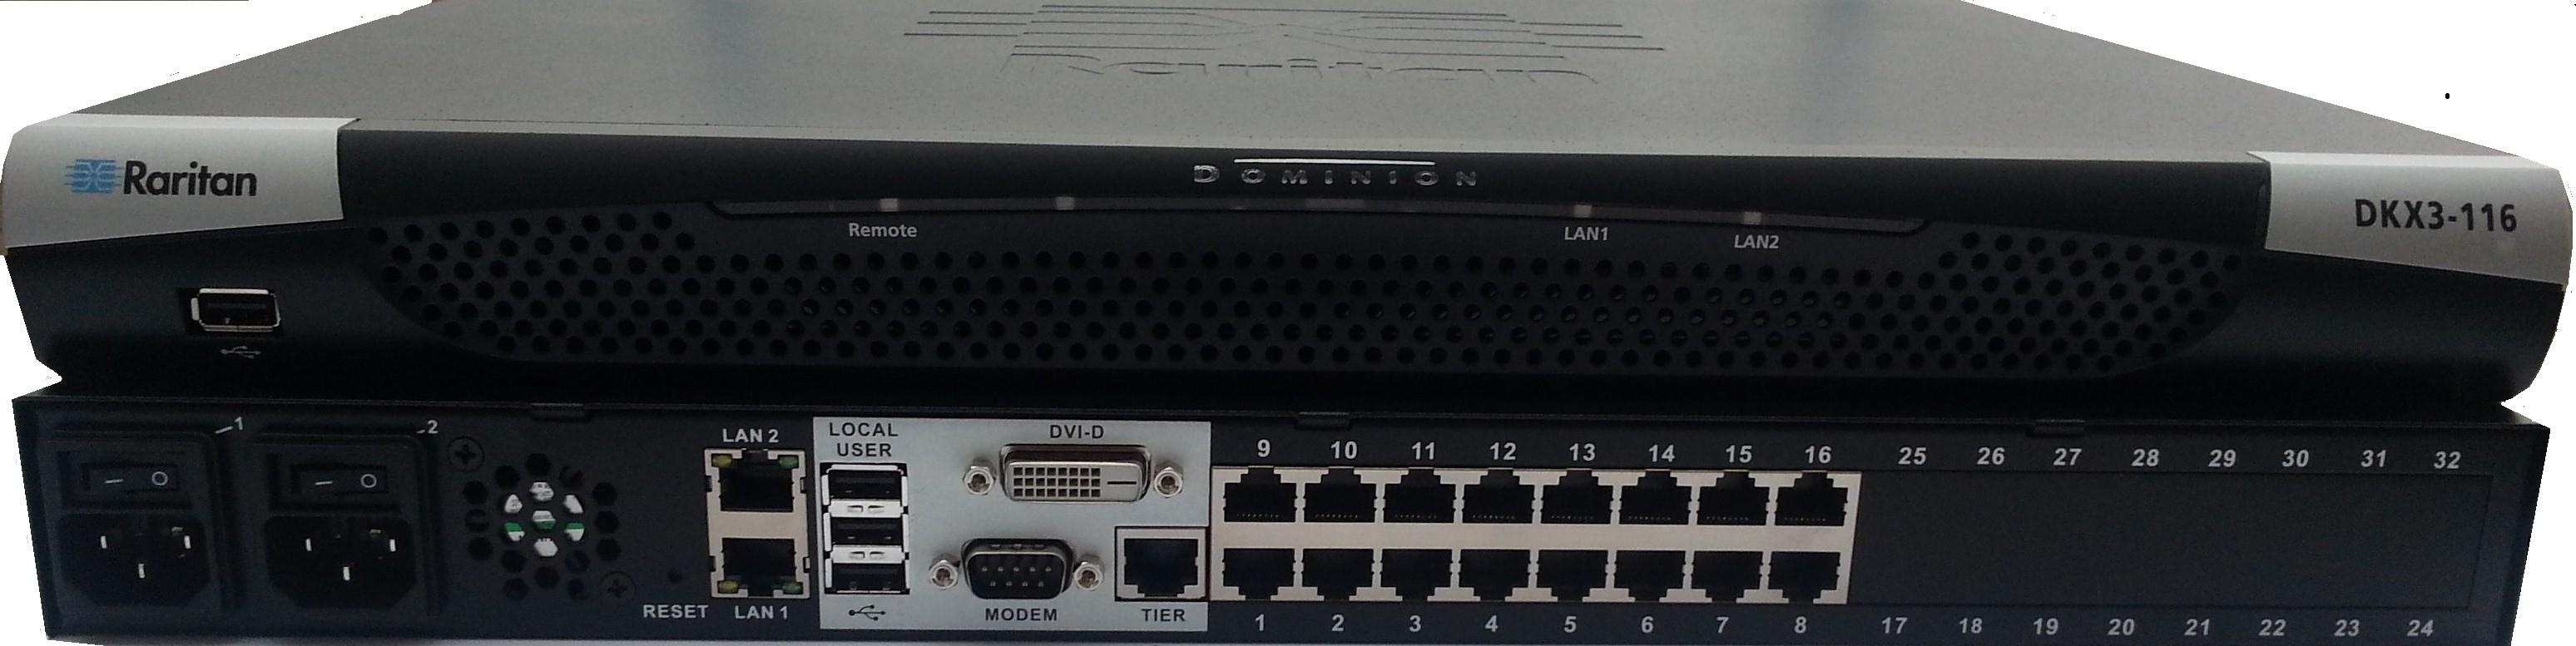 Raritan 16-Port 1-User Dominion KX III KVM-Over-Ip Switch